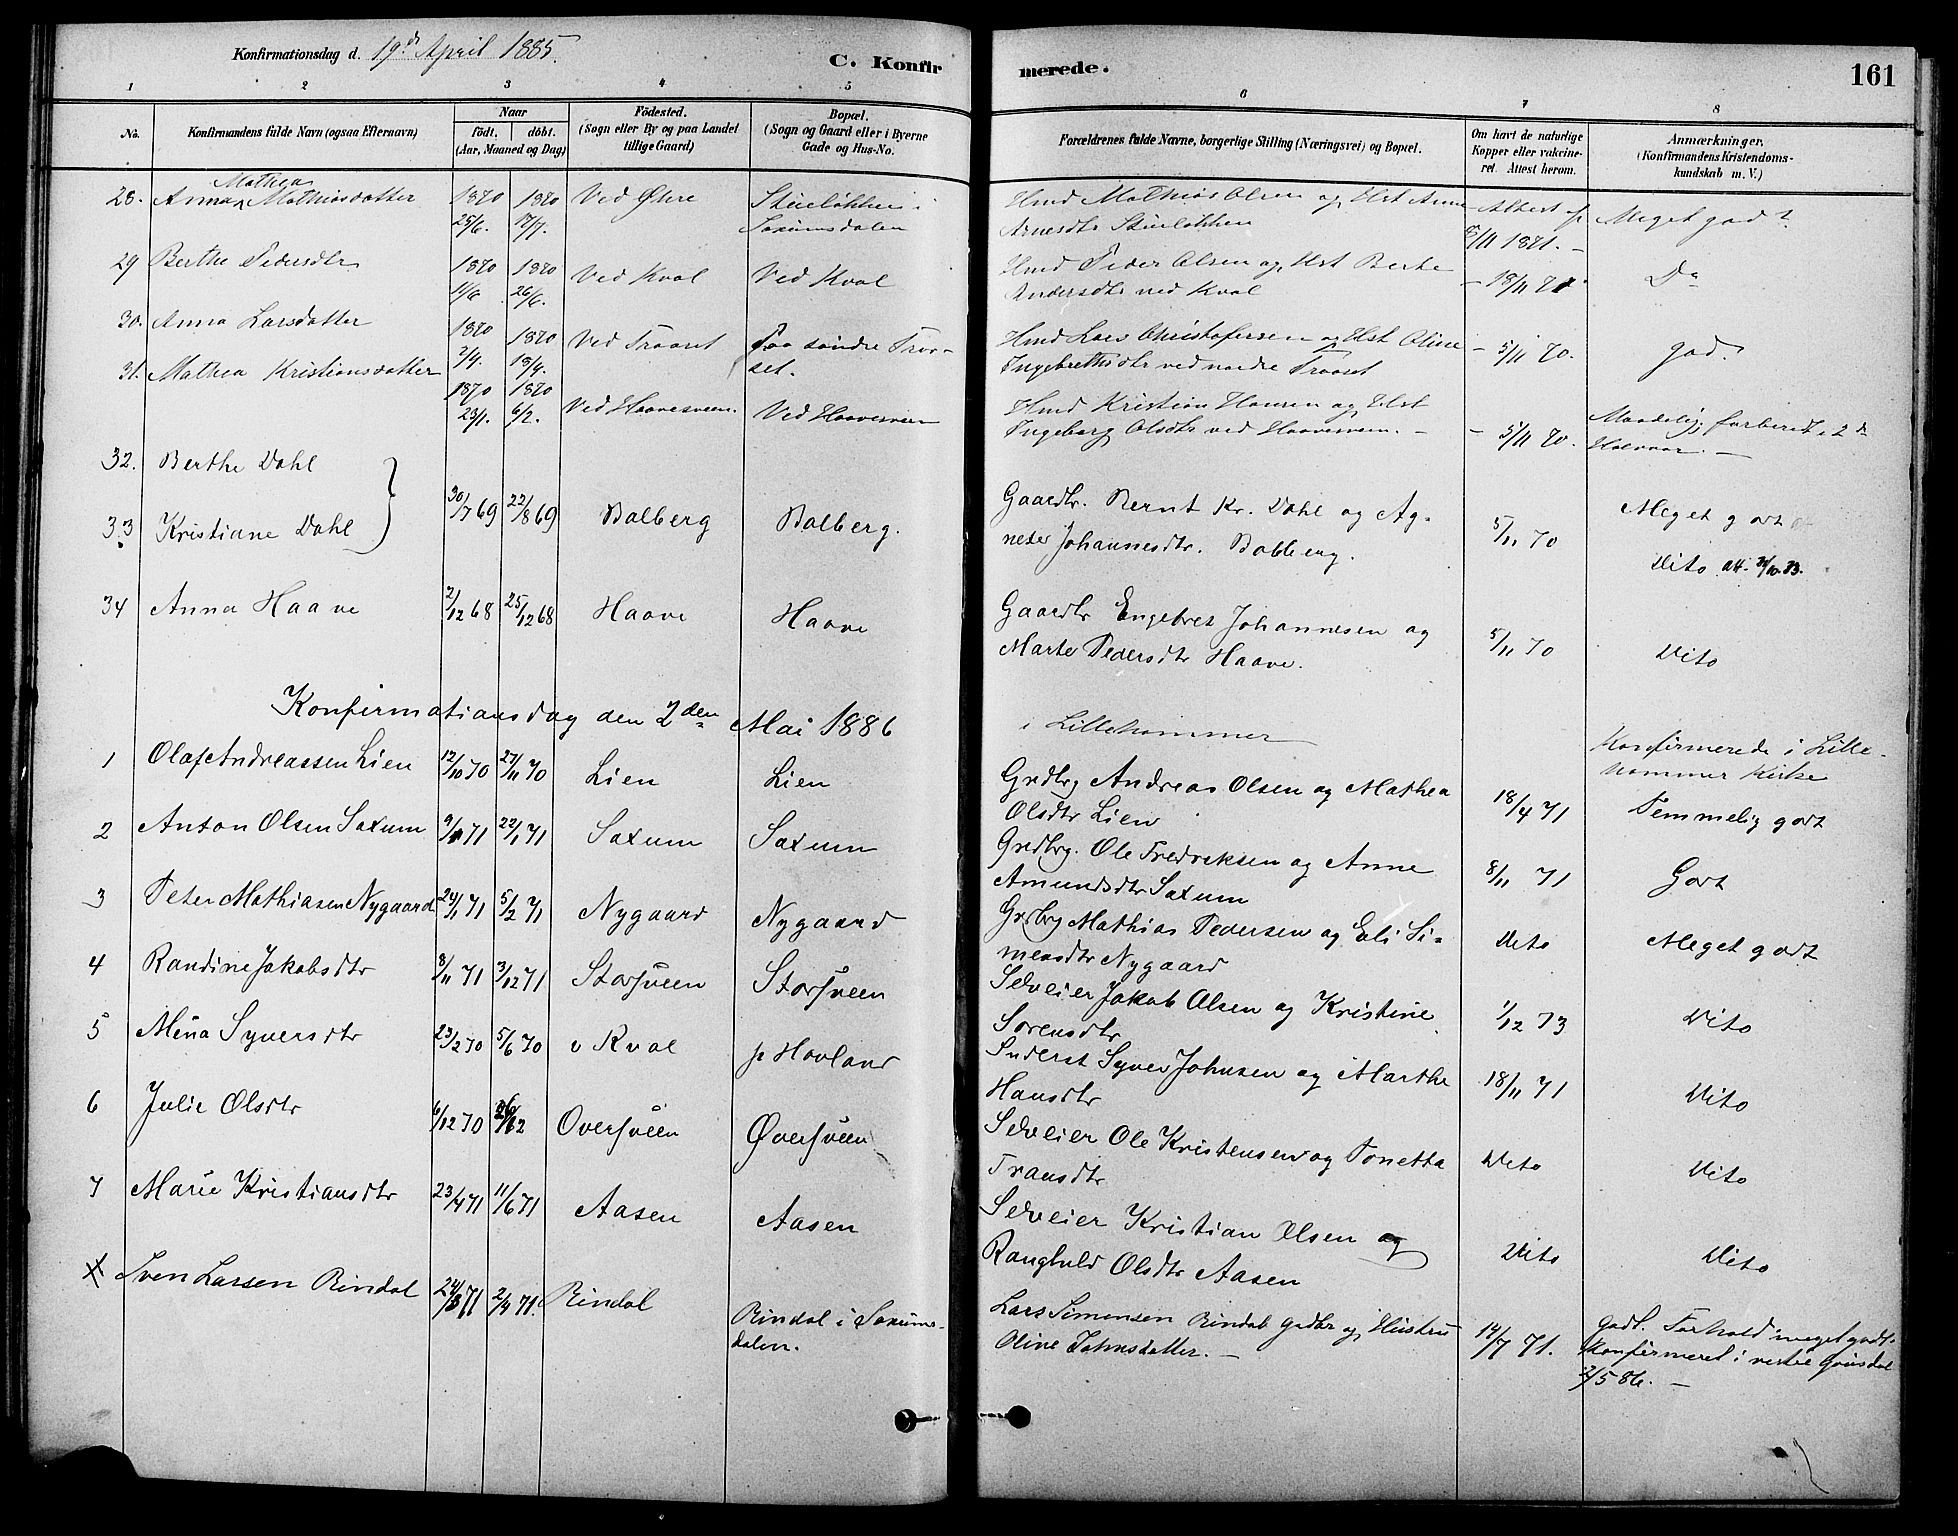 SAH, Fåberg prestekontor, Ministerialbok nr. 8, 1879-1898, s. 161